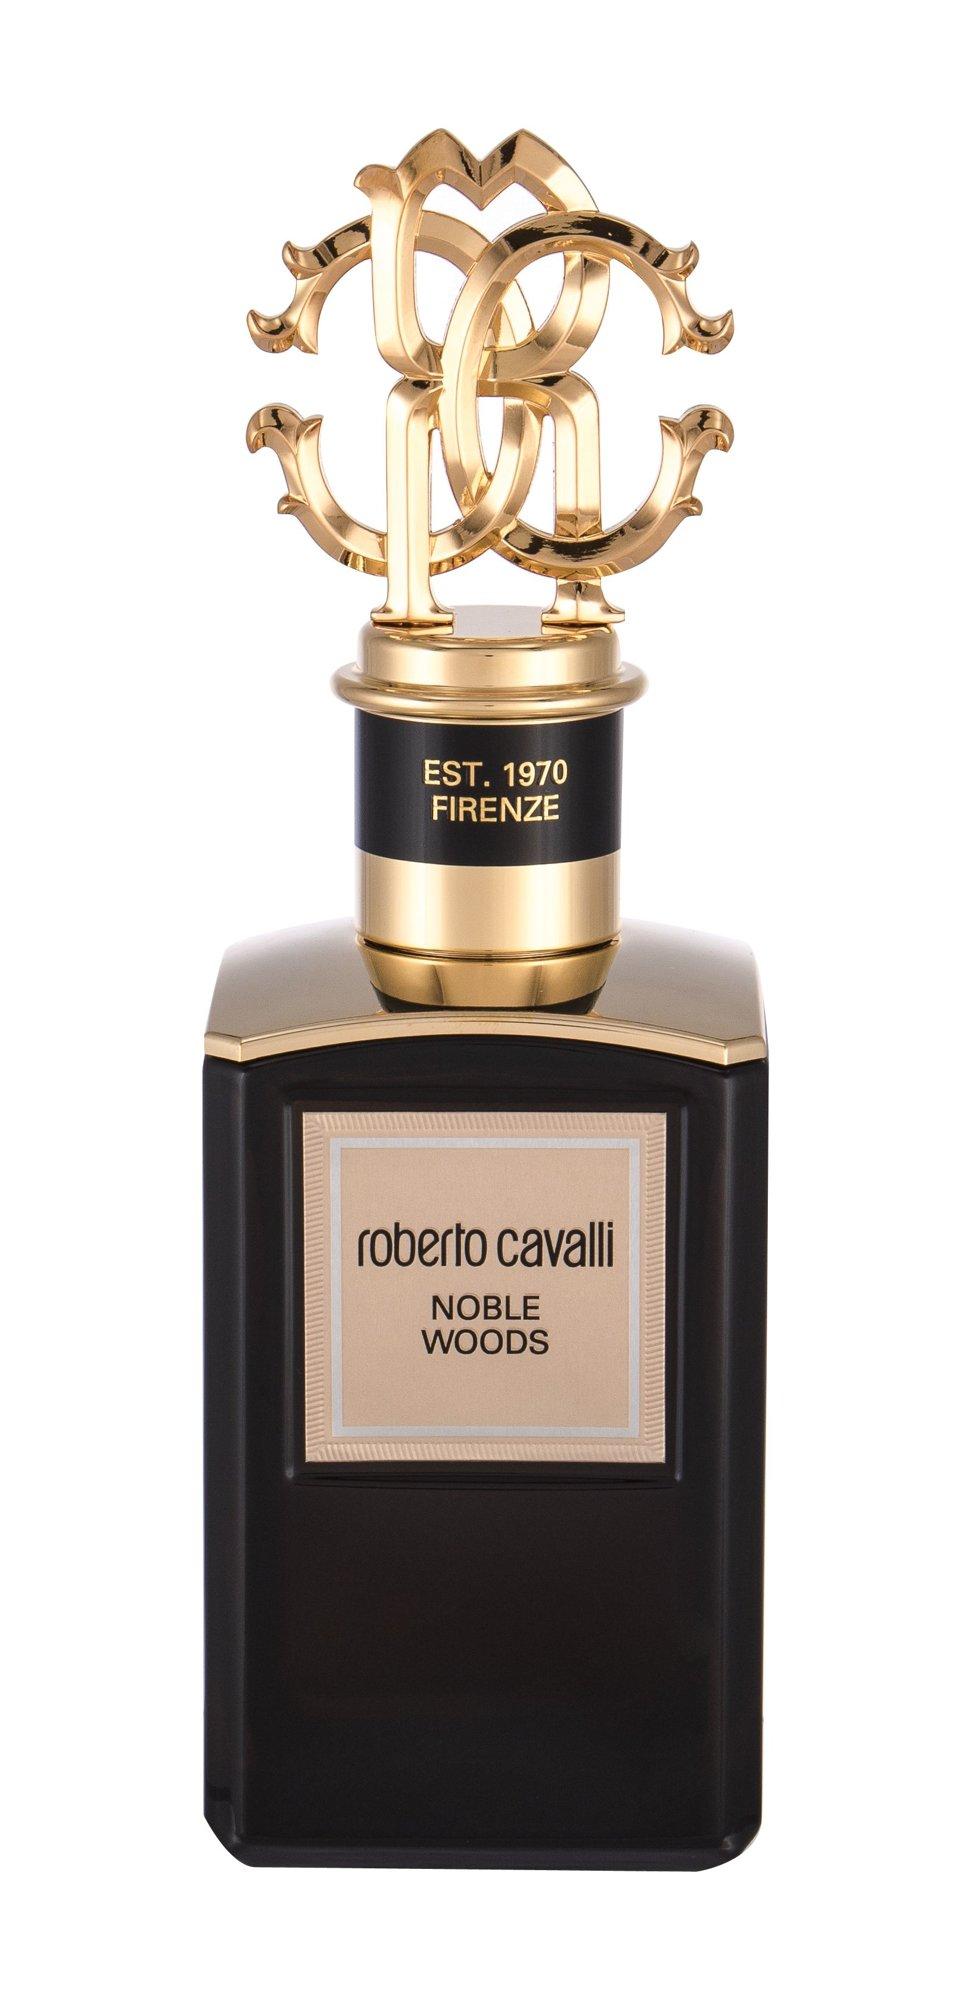 Roberto Cavalli Noble Woods Eau de Parfum 100ml